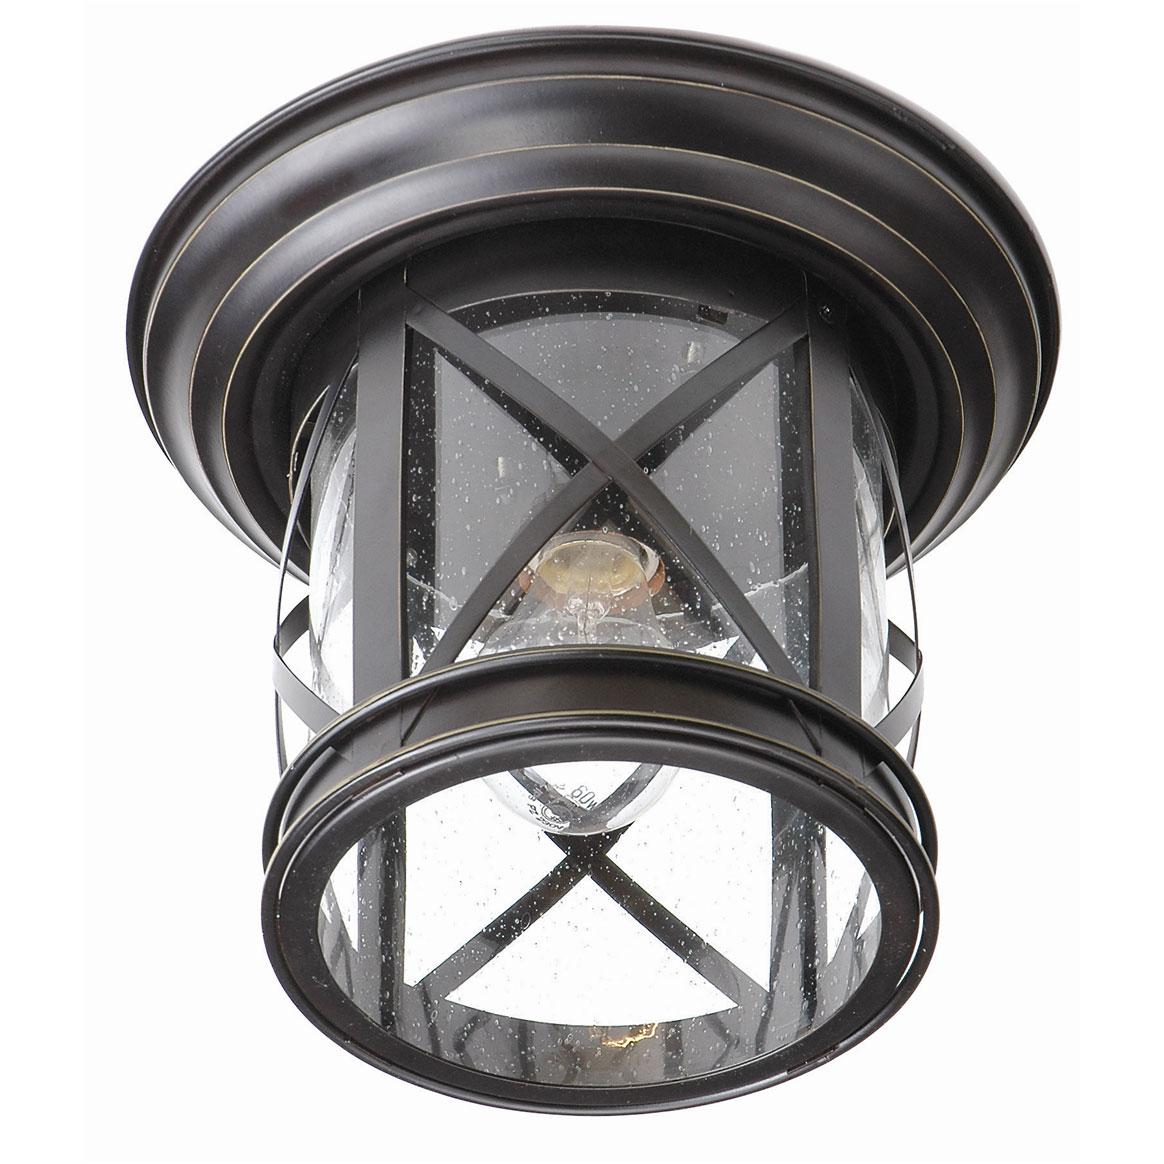 Flush mount outdoor lighting - New England Coastal Outdoor Flush Mount By Trans Globe 5128 Rob